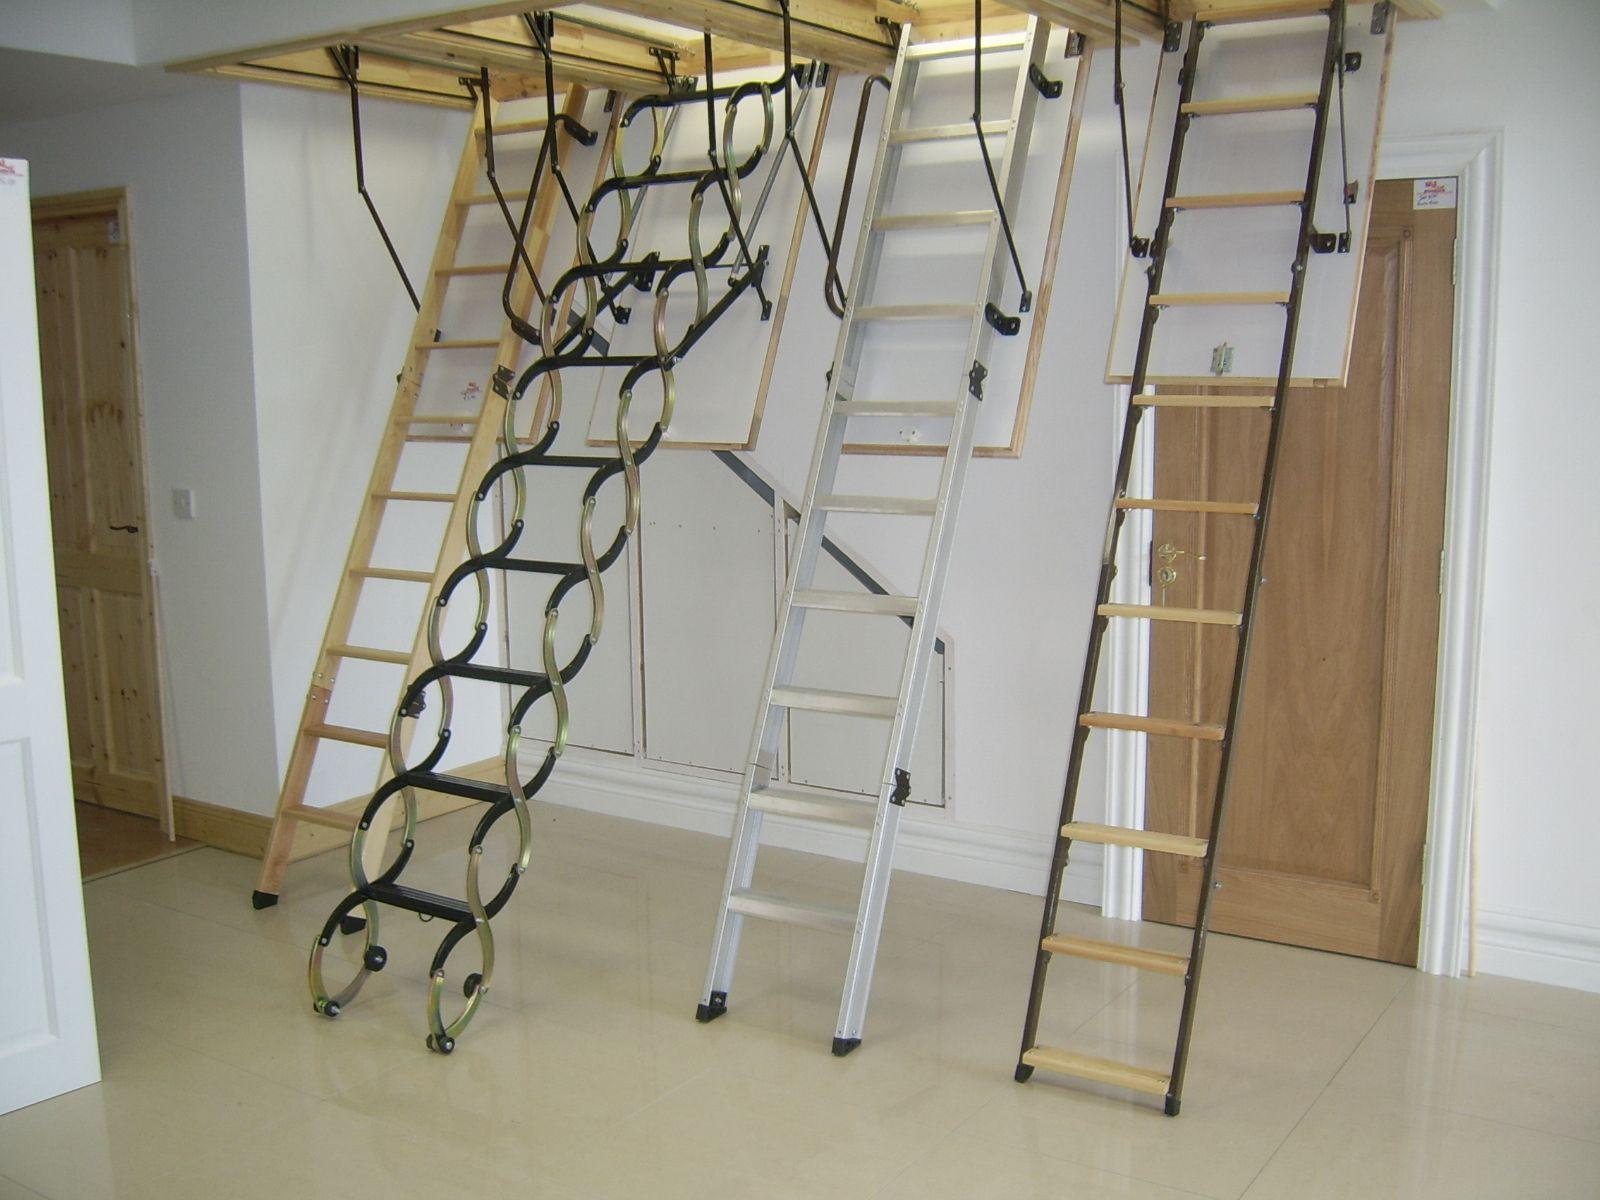 Attic Stairs Attic Ladders By Www Murphylarkin Com Attic Access